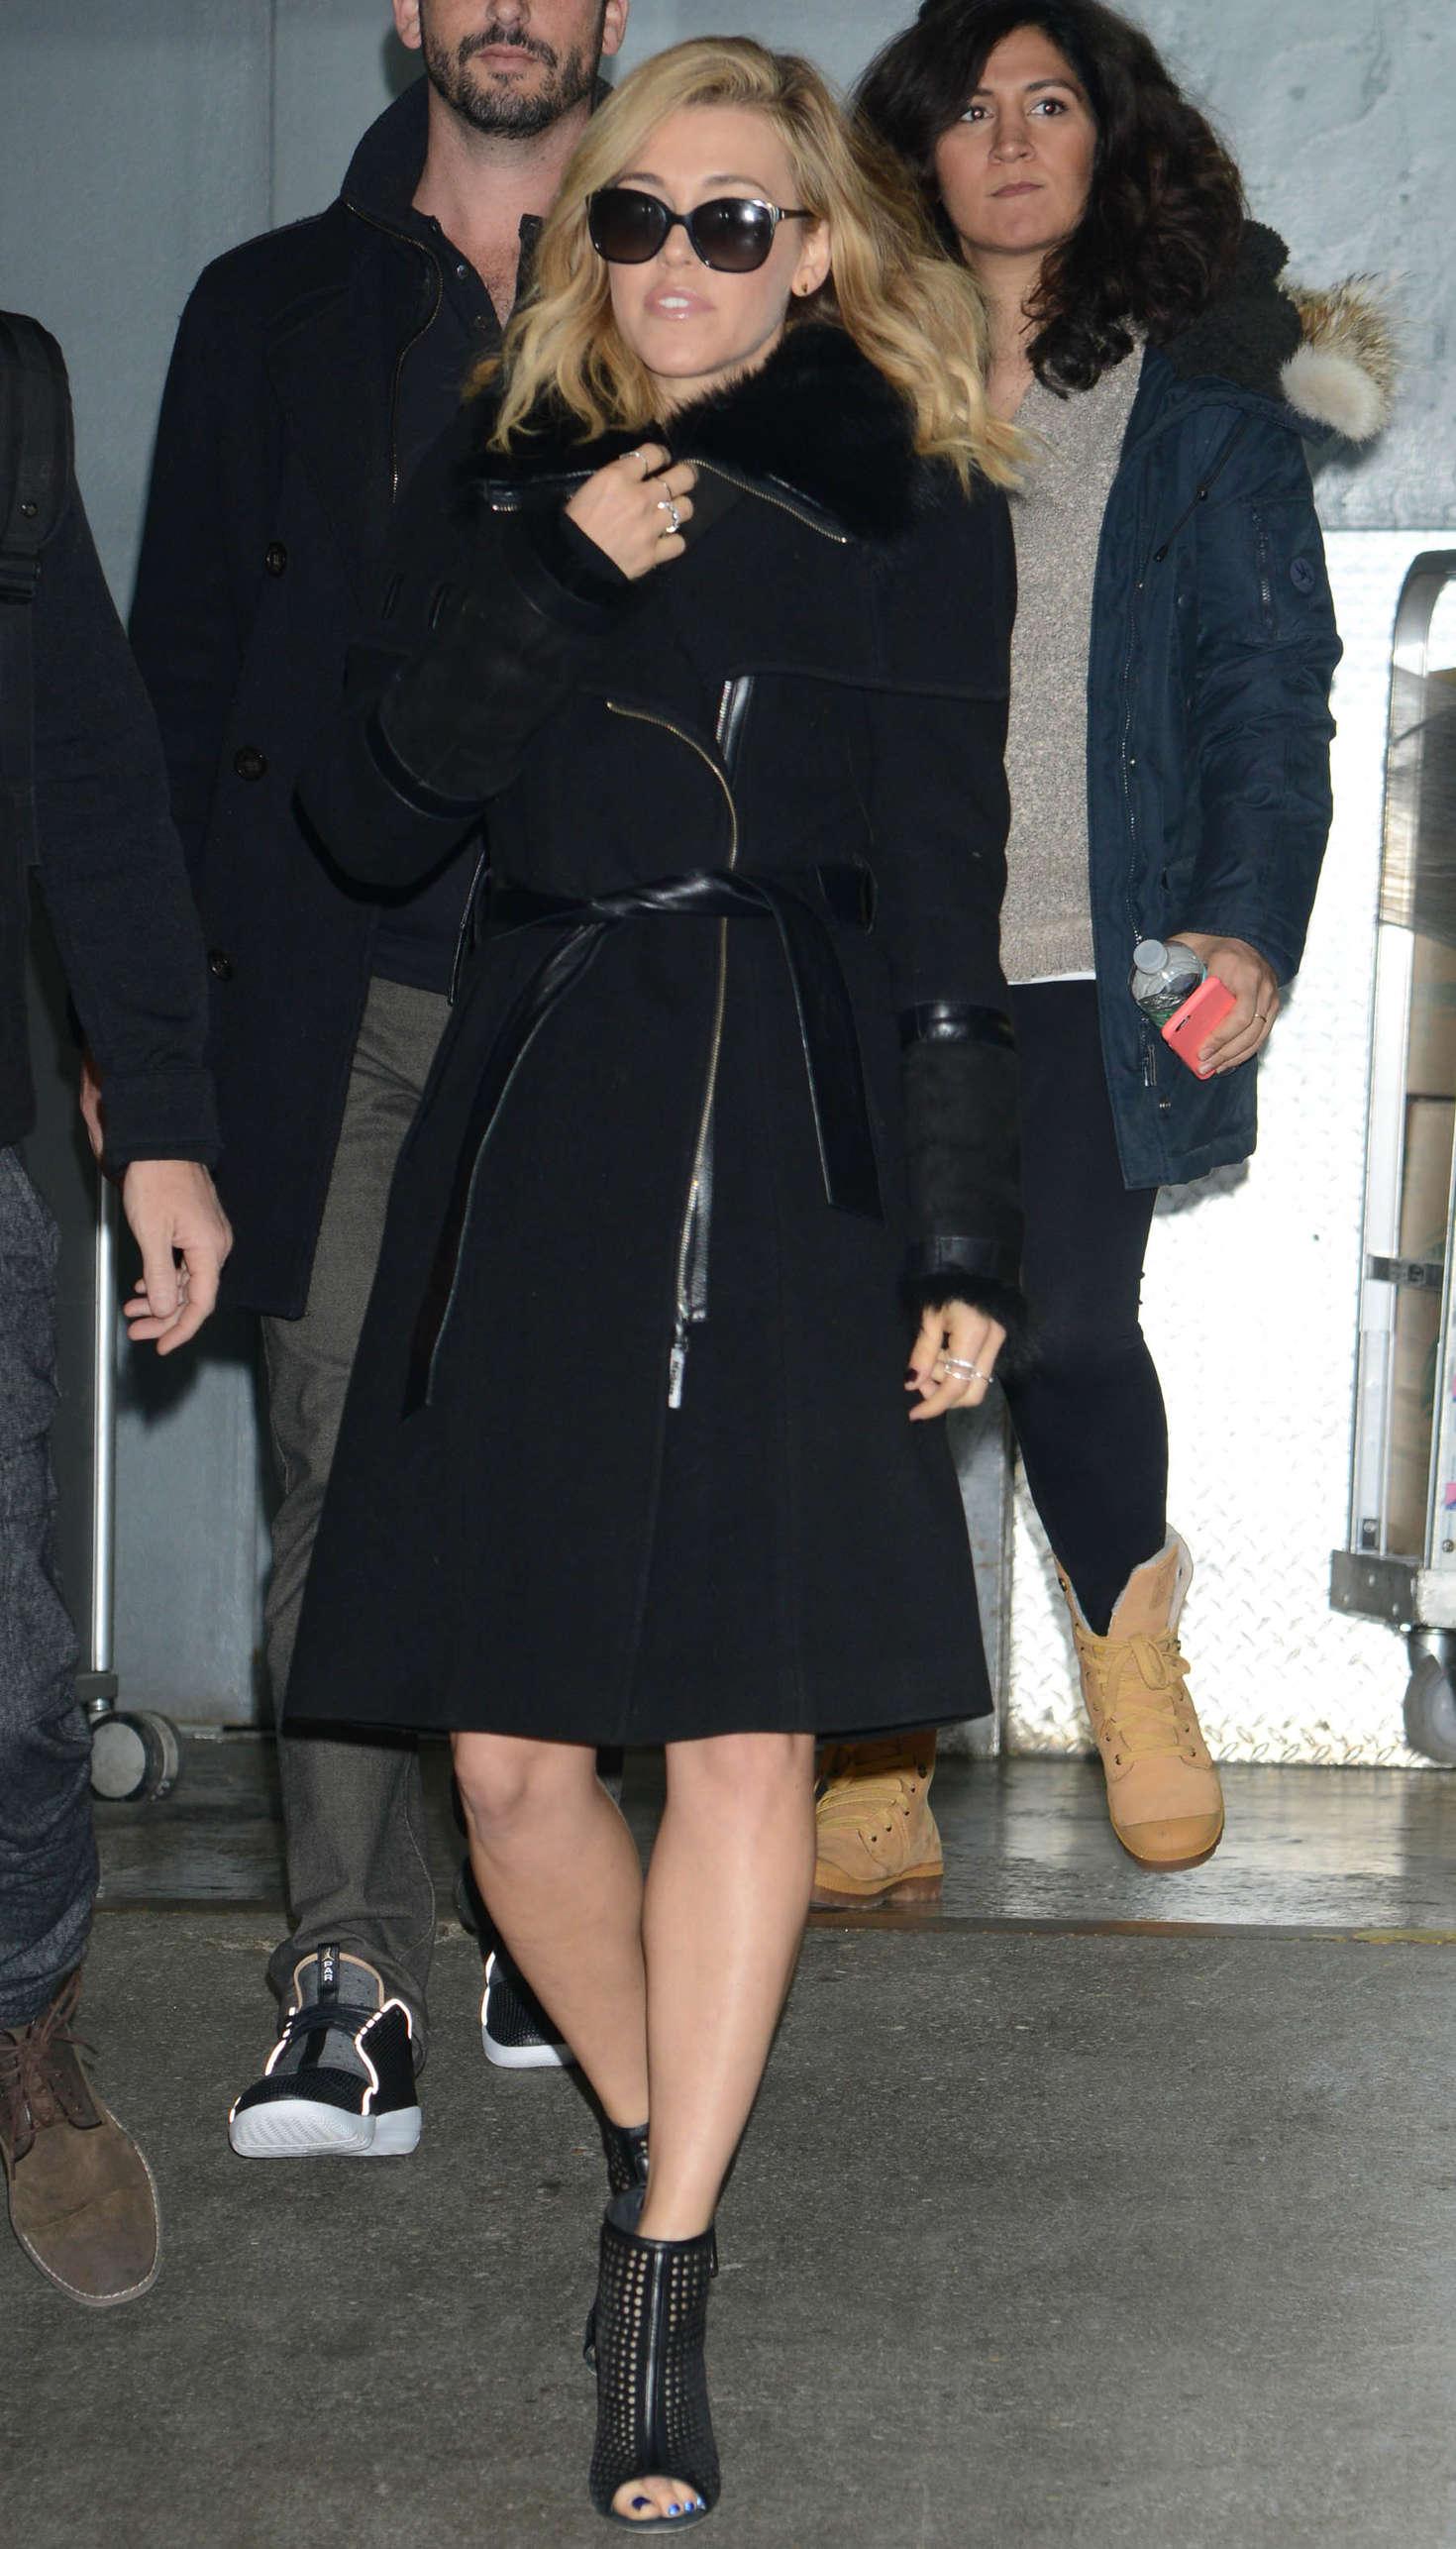 Rachel Platten Leaving a Building in Manhattan